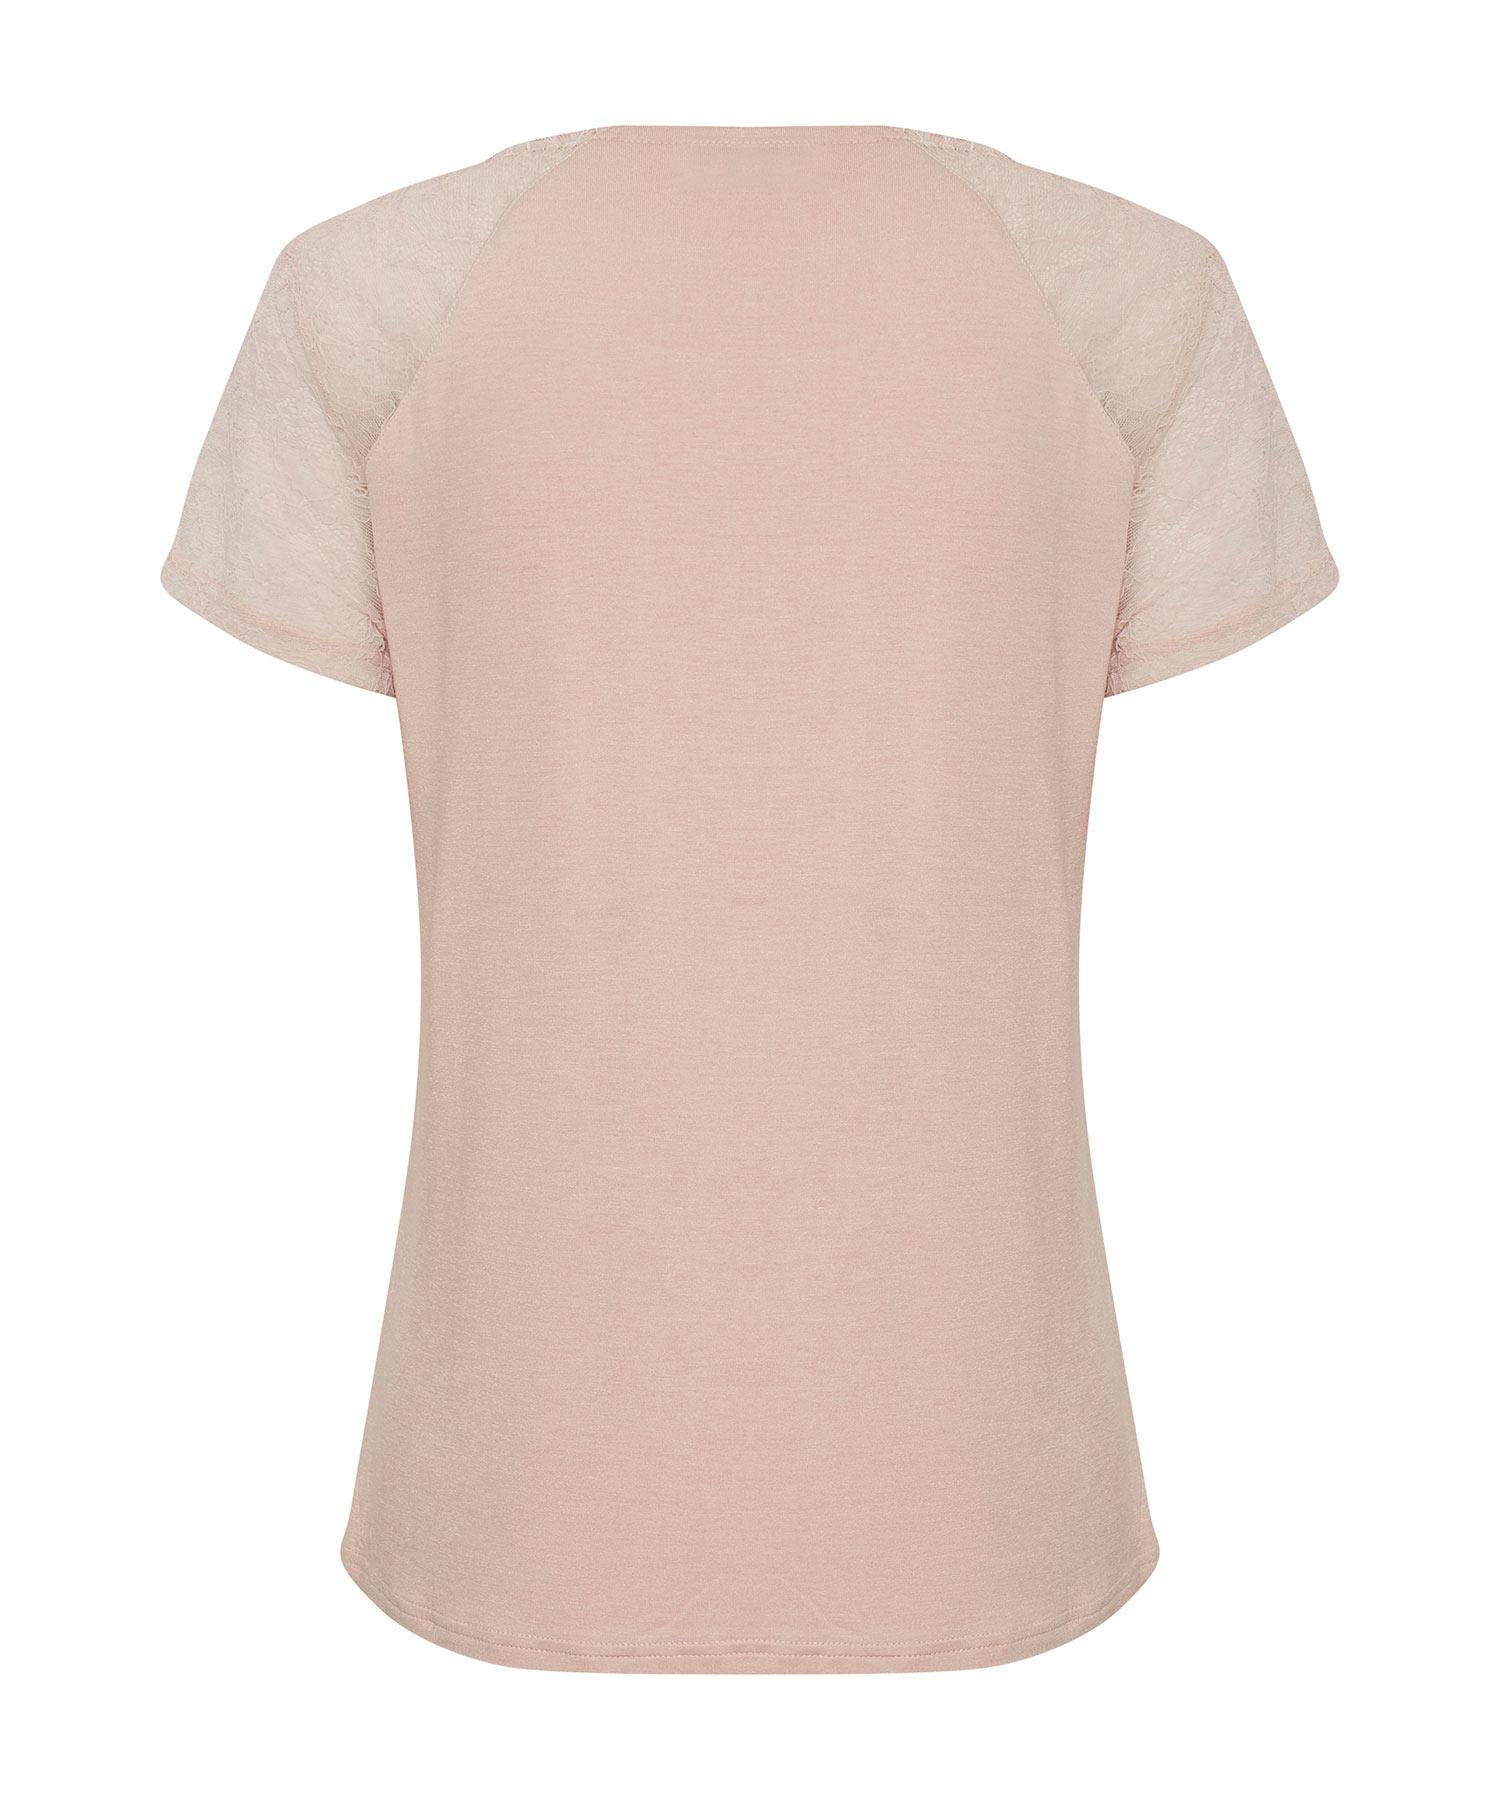 T-shirt με δαντέλα